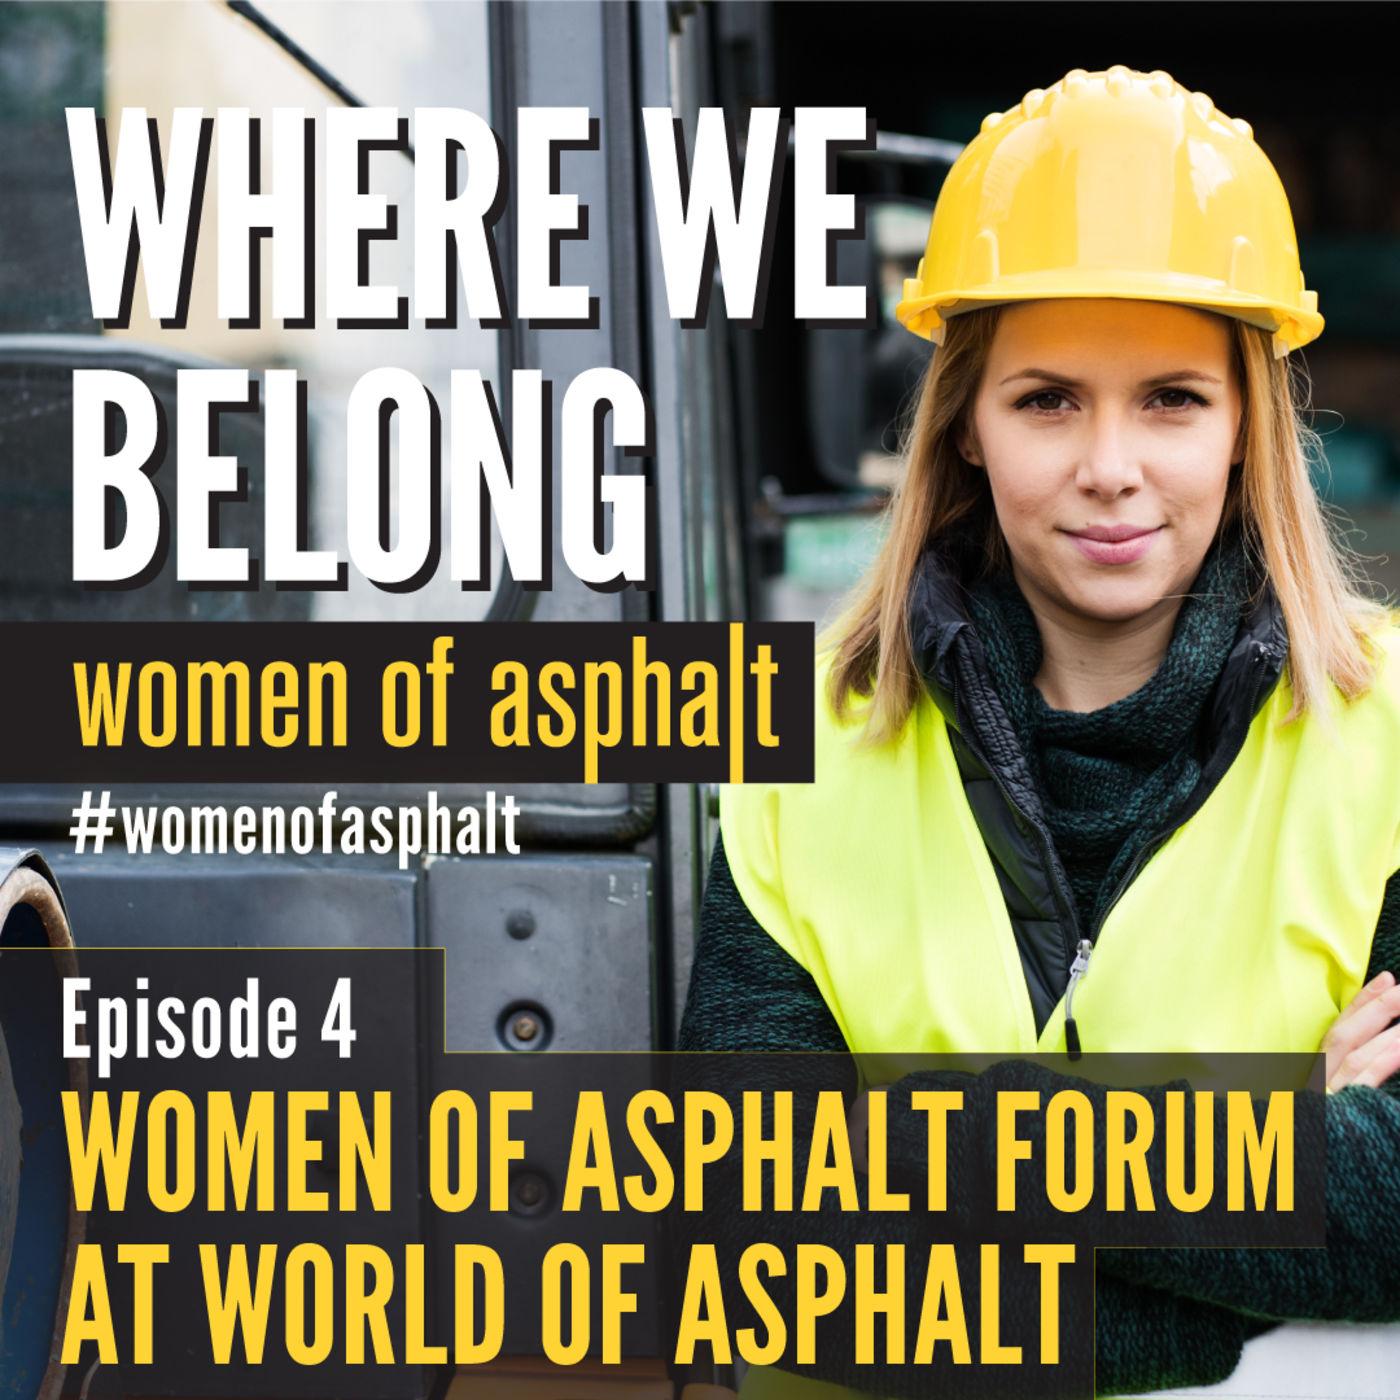 Women of Asphalt Forum at World of Asphalt 2019